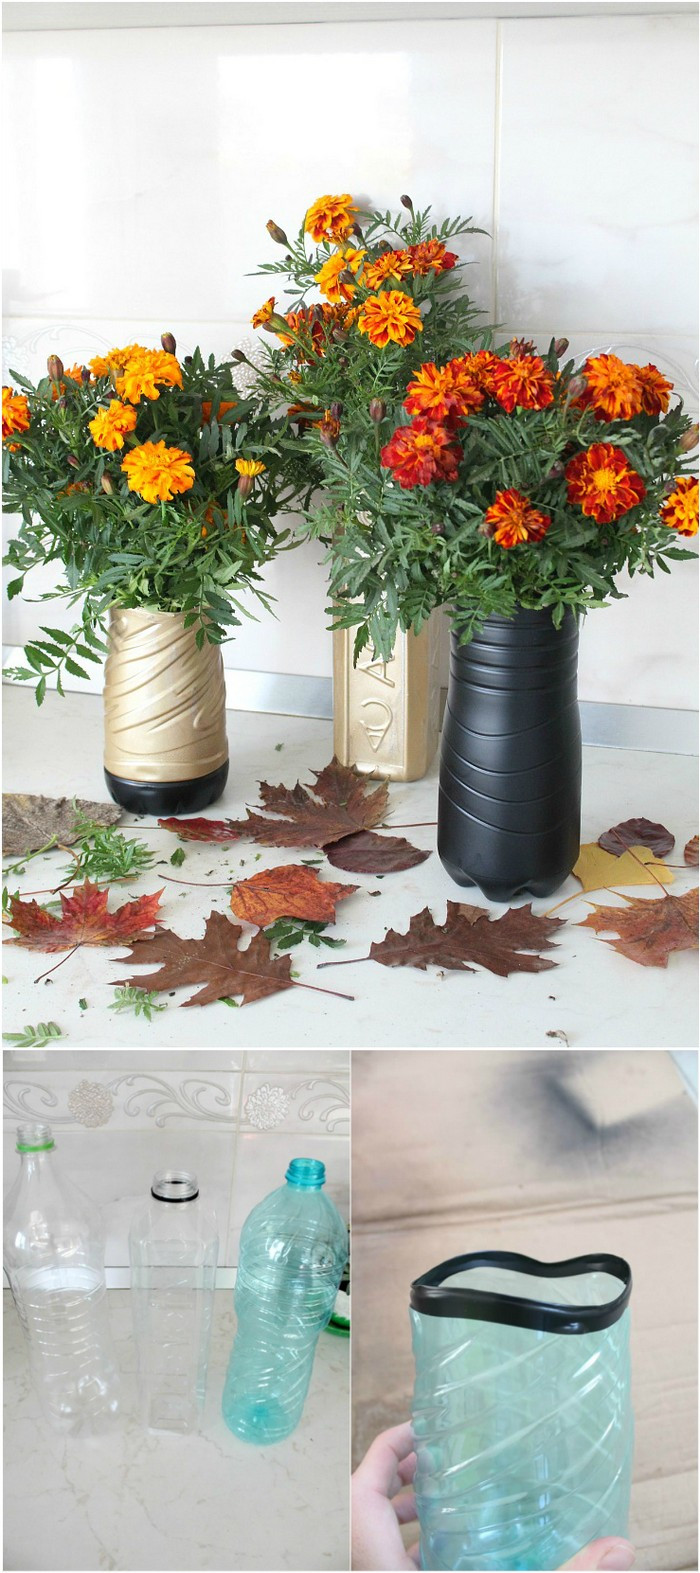 flower vase design plastic bottle of creative plastic bottle crafts ideas that will amaze you• diy crafts in plastic bottle crafts